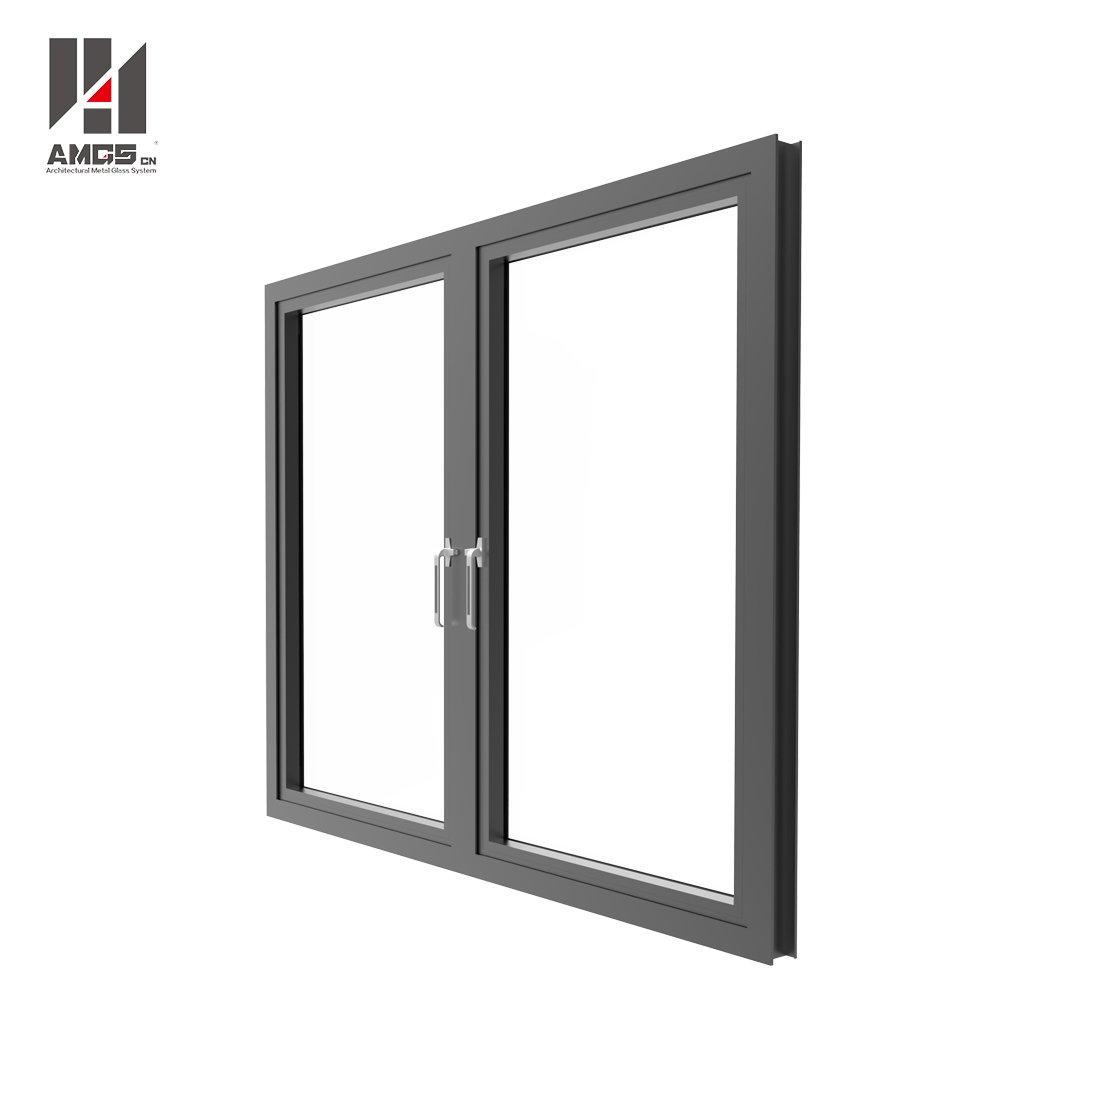 AMGS Aluminium Double Glazed Windows With Casement Aluminum Casement Windows image6